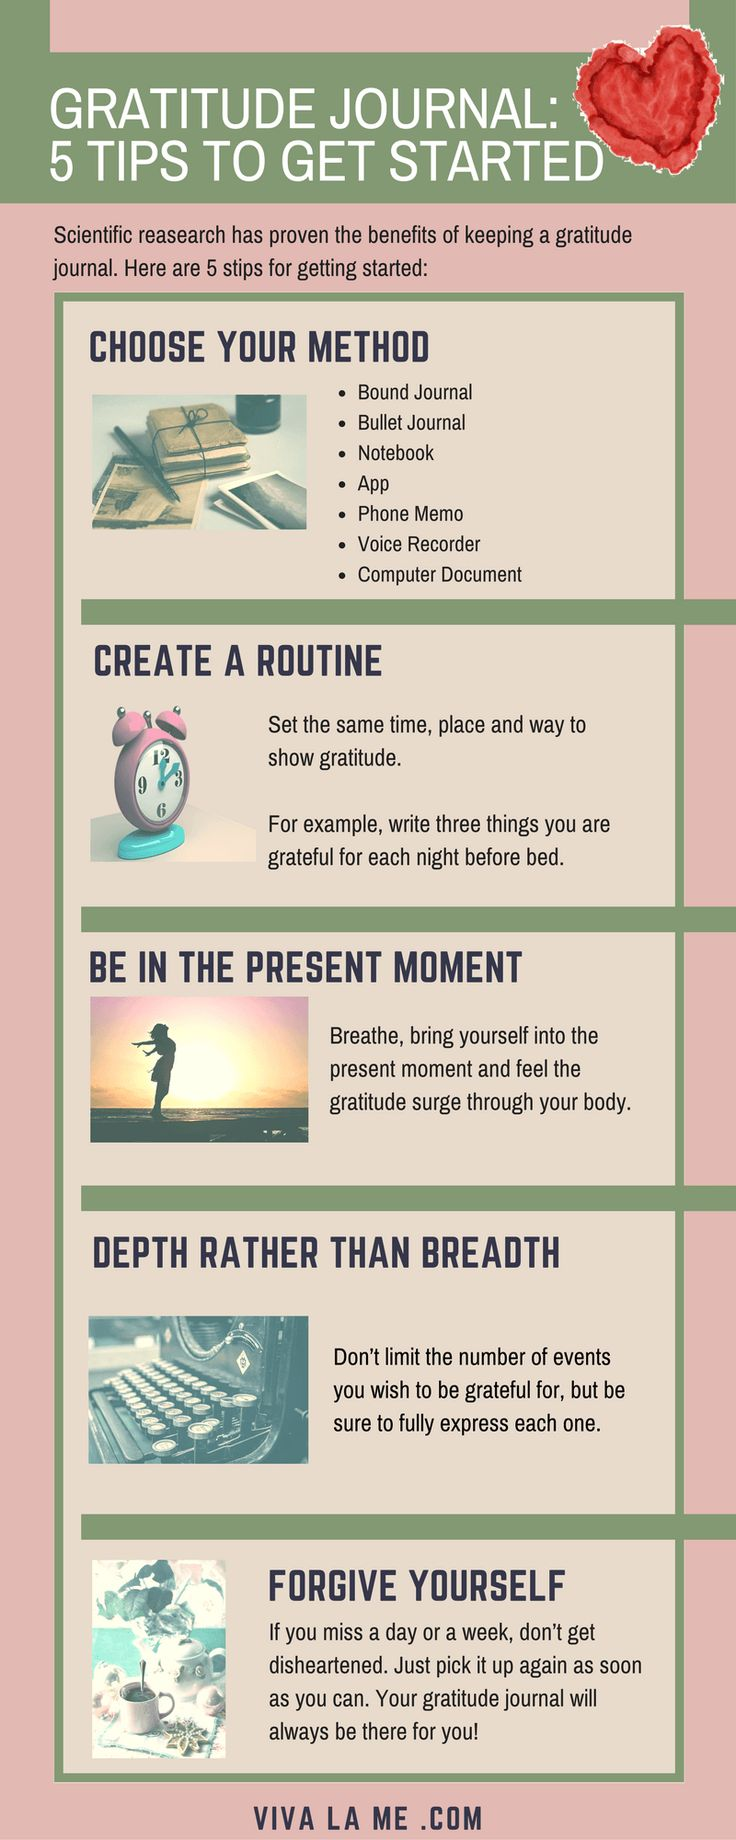 How To Start A Gratitude Journal — VivaLaMe